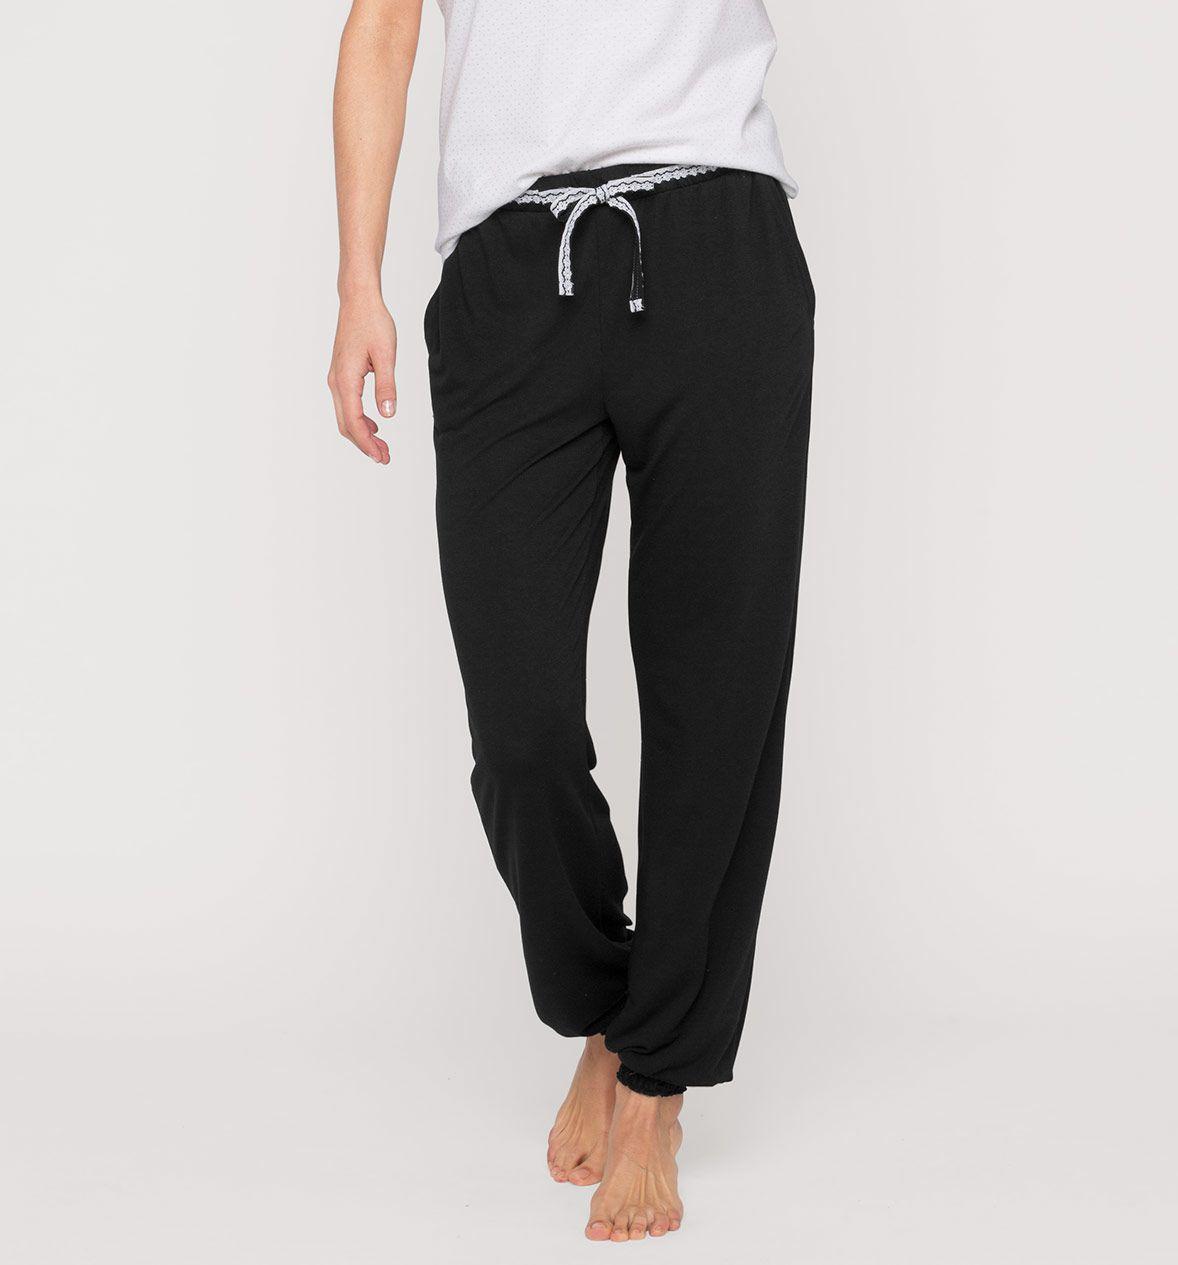 Pantalon De Pijama C A Pantalones De Pijama Pantalones Y